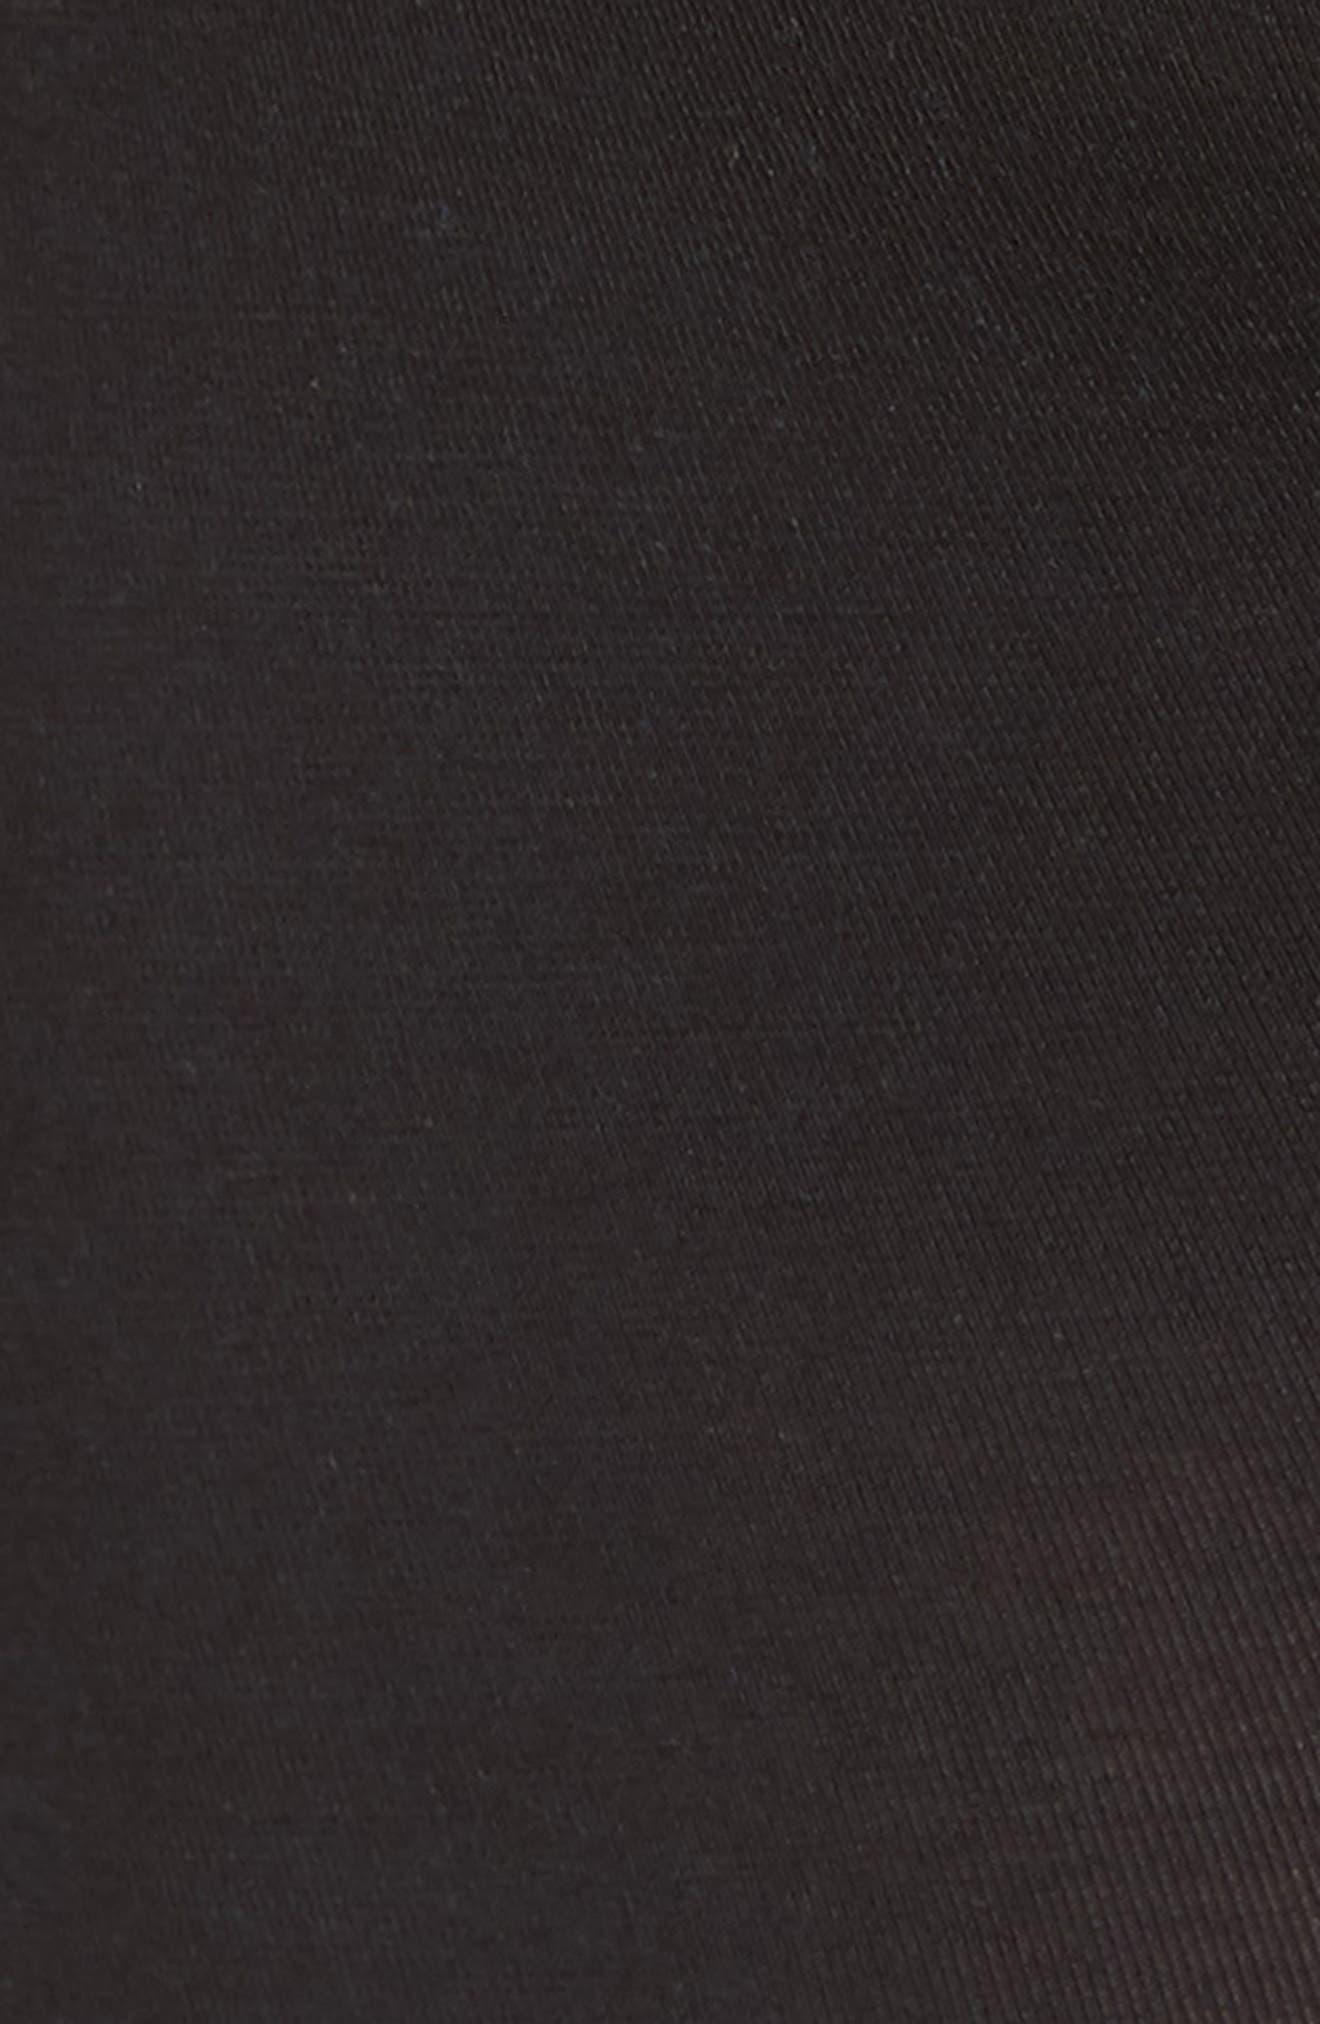 Second Skin Boxer Briefs,                             Alternate thumbnail 5, color,                             Black/ Turbulence